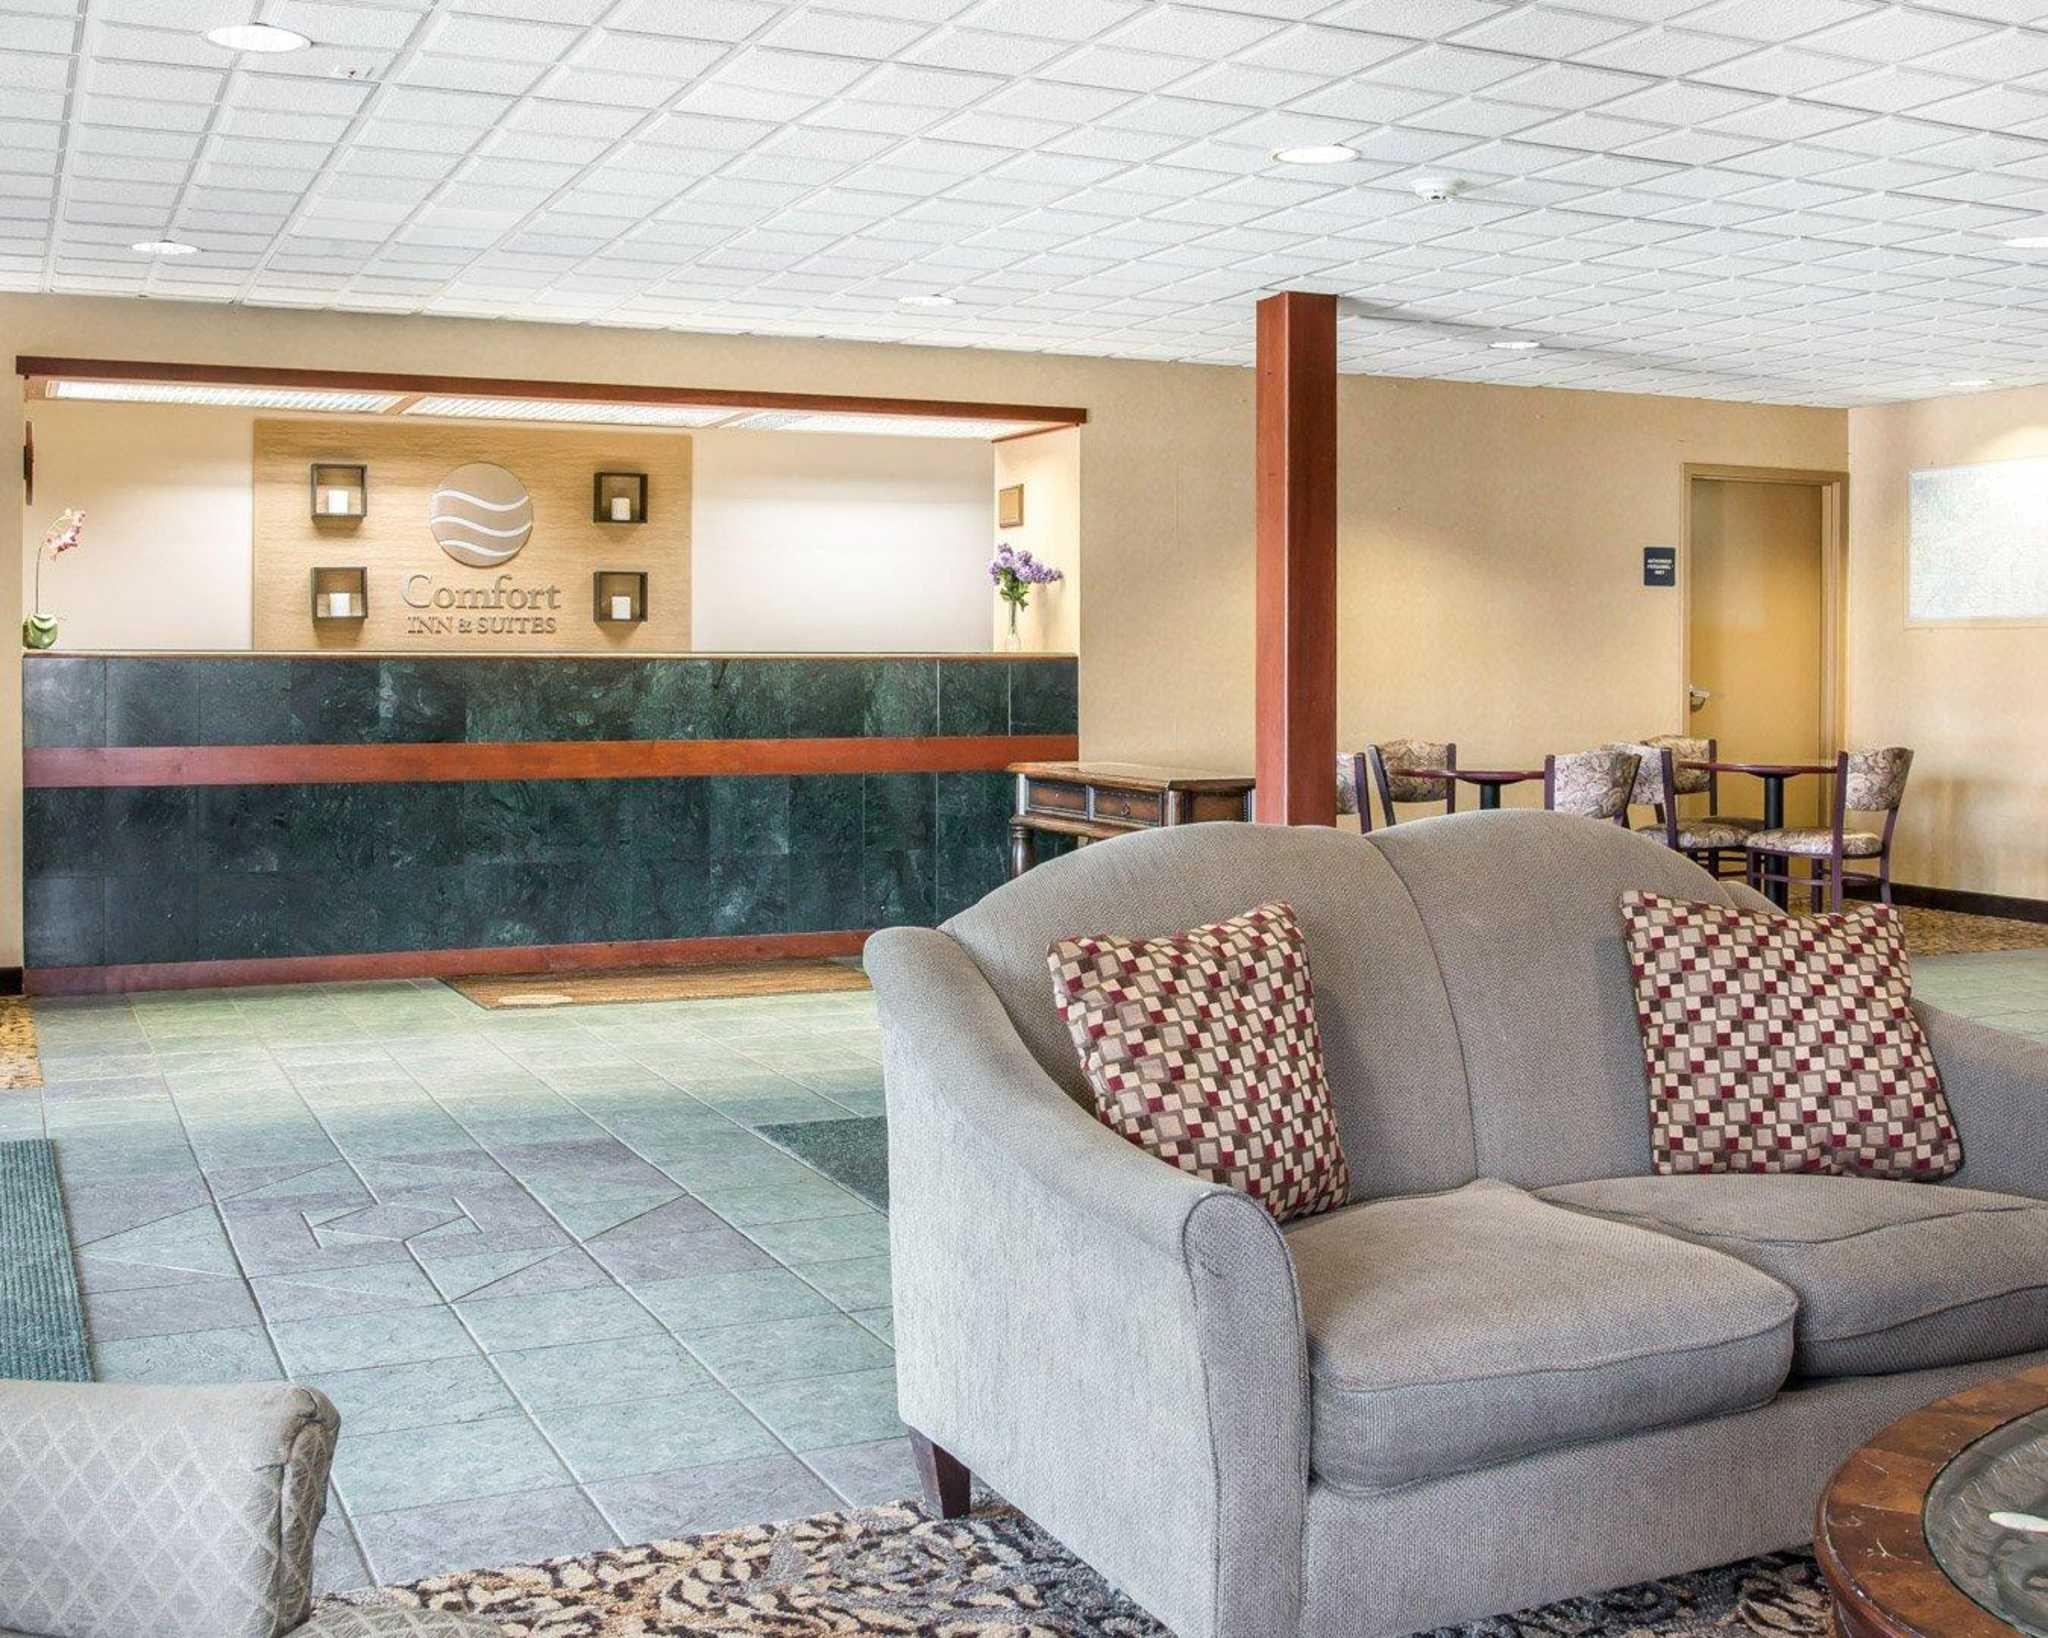 fort Inn & Suites Maumee Toledo I80 90 Maumee Ohio OH LocalDatabase